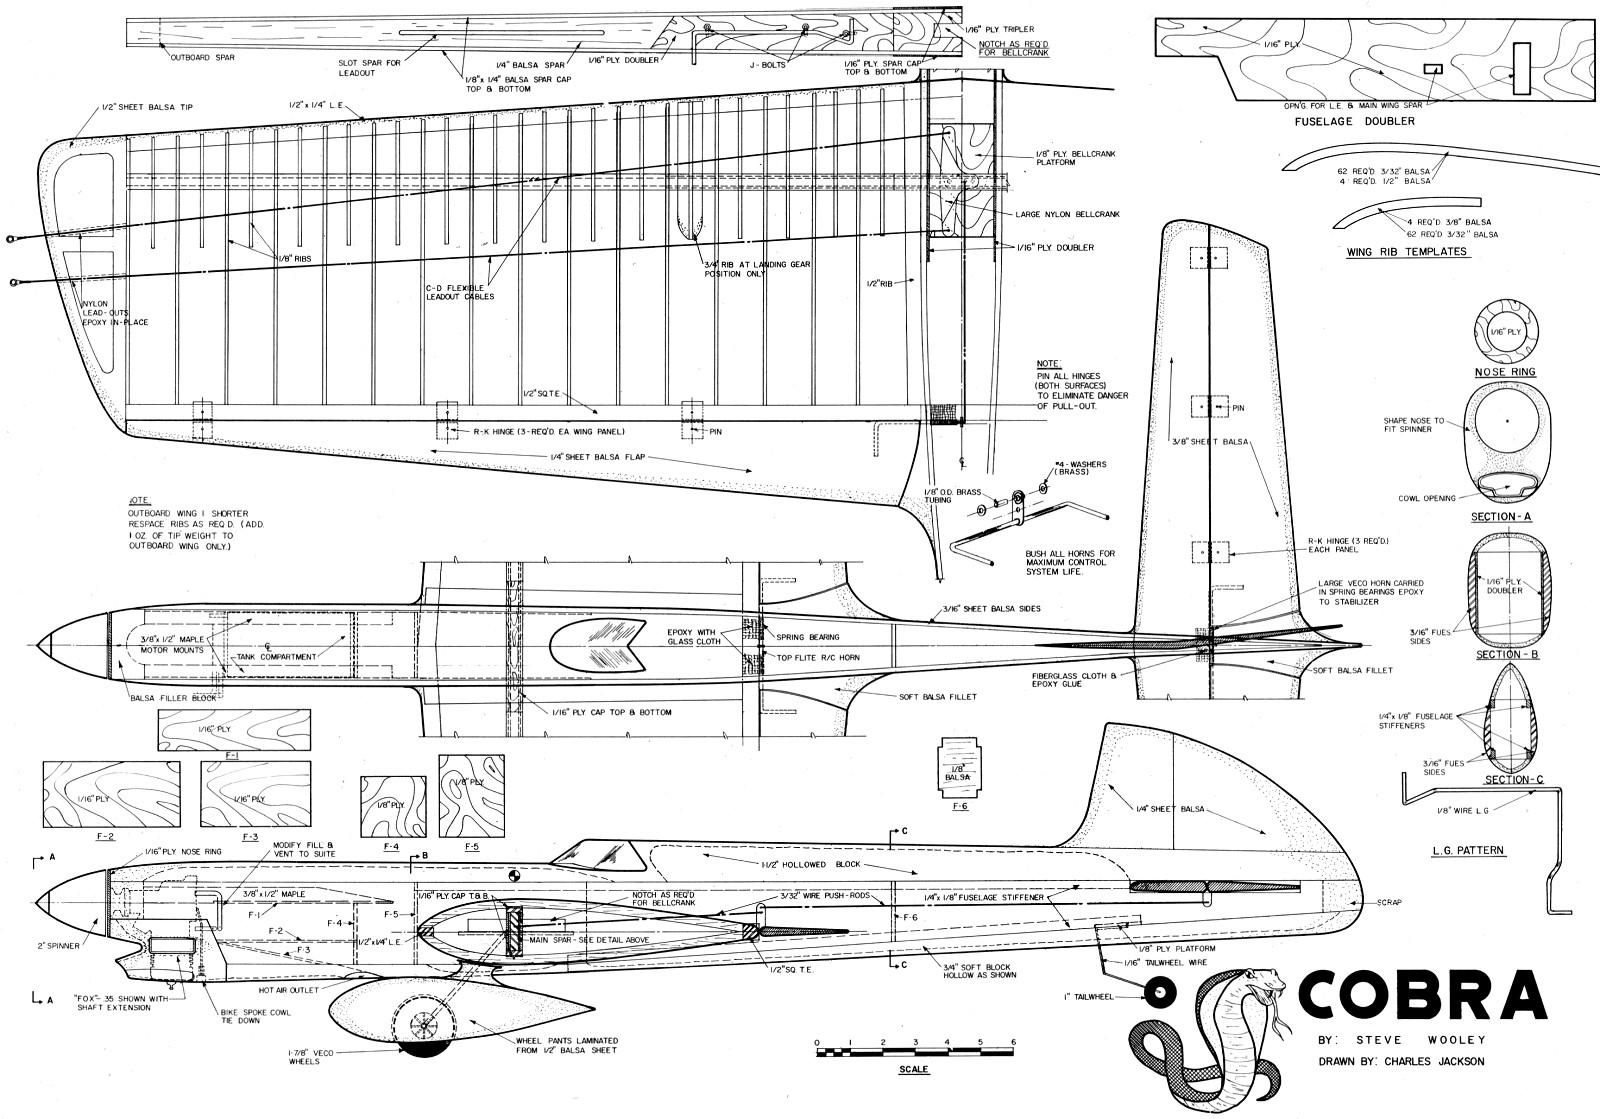 Cobra February American Aircraft Modeler